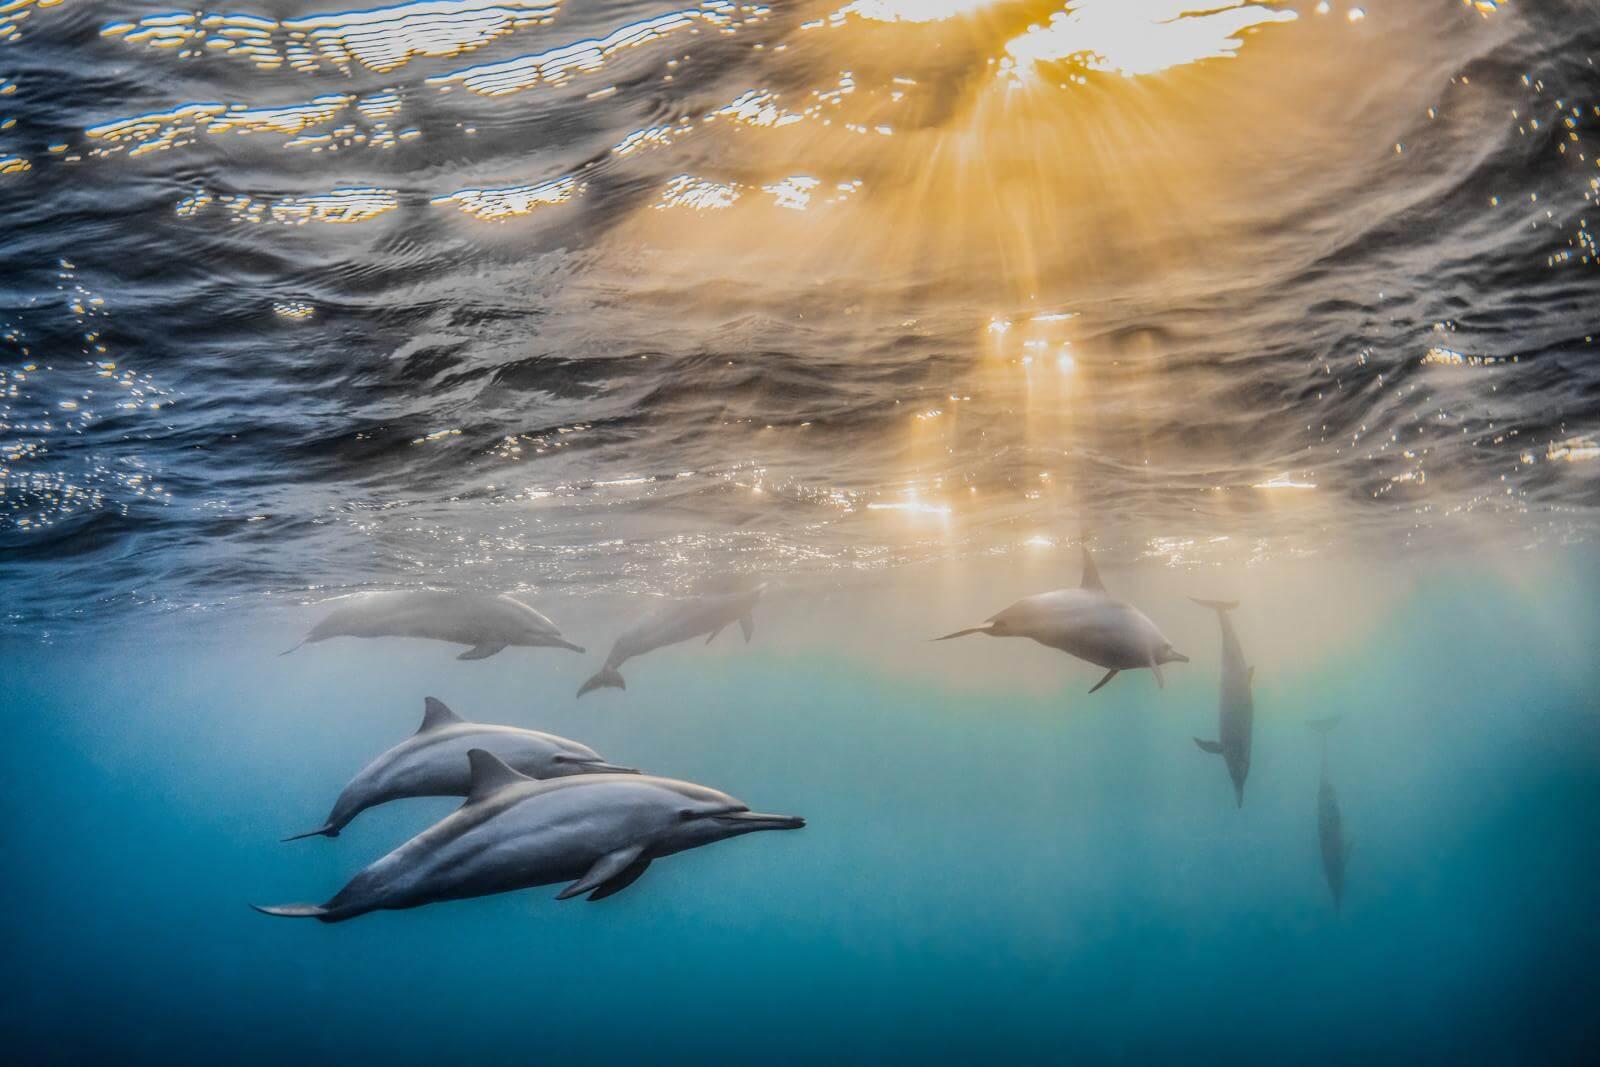 Dolphins by Rafael Fernández Caballero